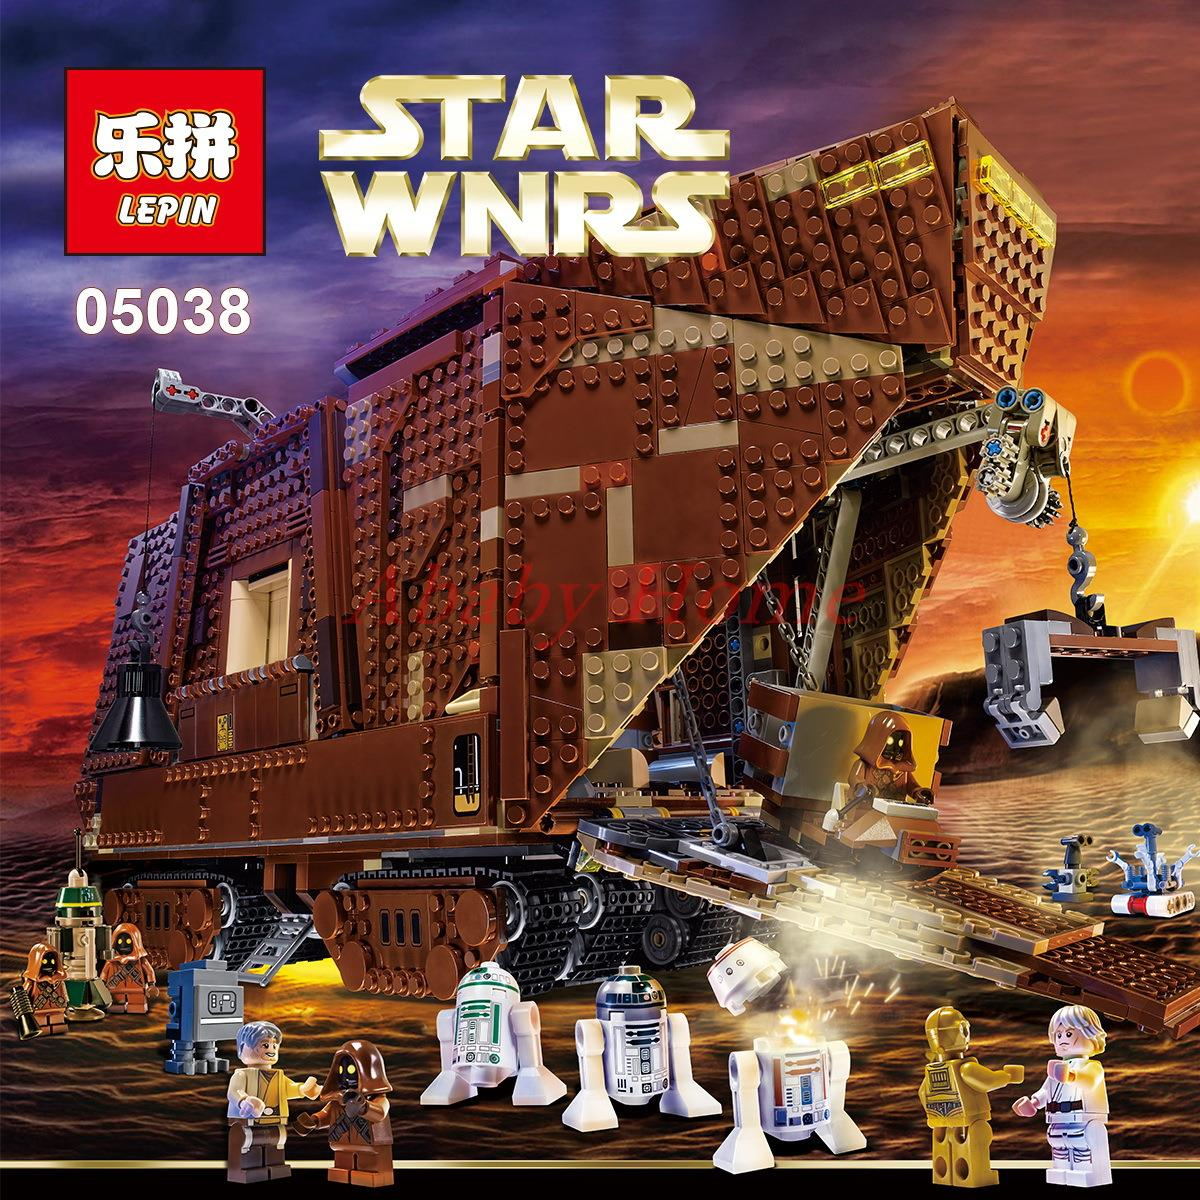 In Stock 2016 font b LEPIN b font 05038 Star Wars Sandcrawler Building Blocks Model Toy3346pcs